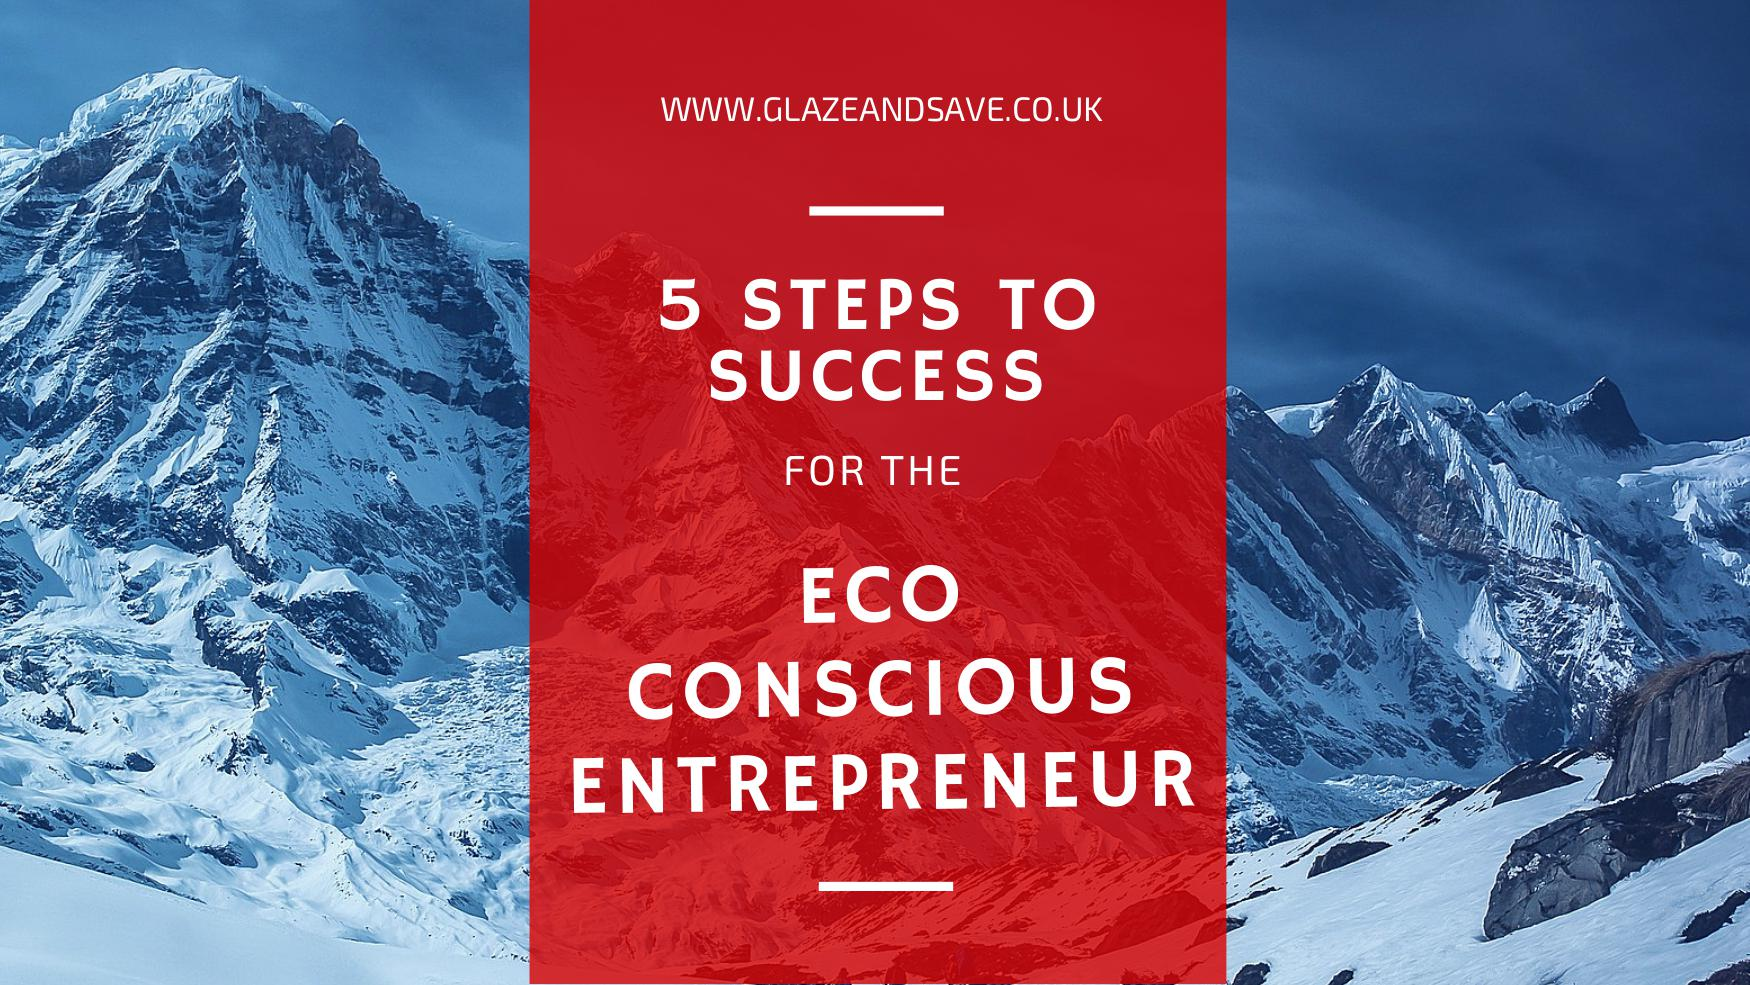 8a98f1c78 Succeeding as a Eco-Conscious Entrepreneur | Glaze & Save